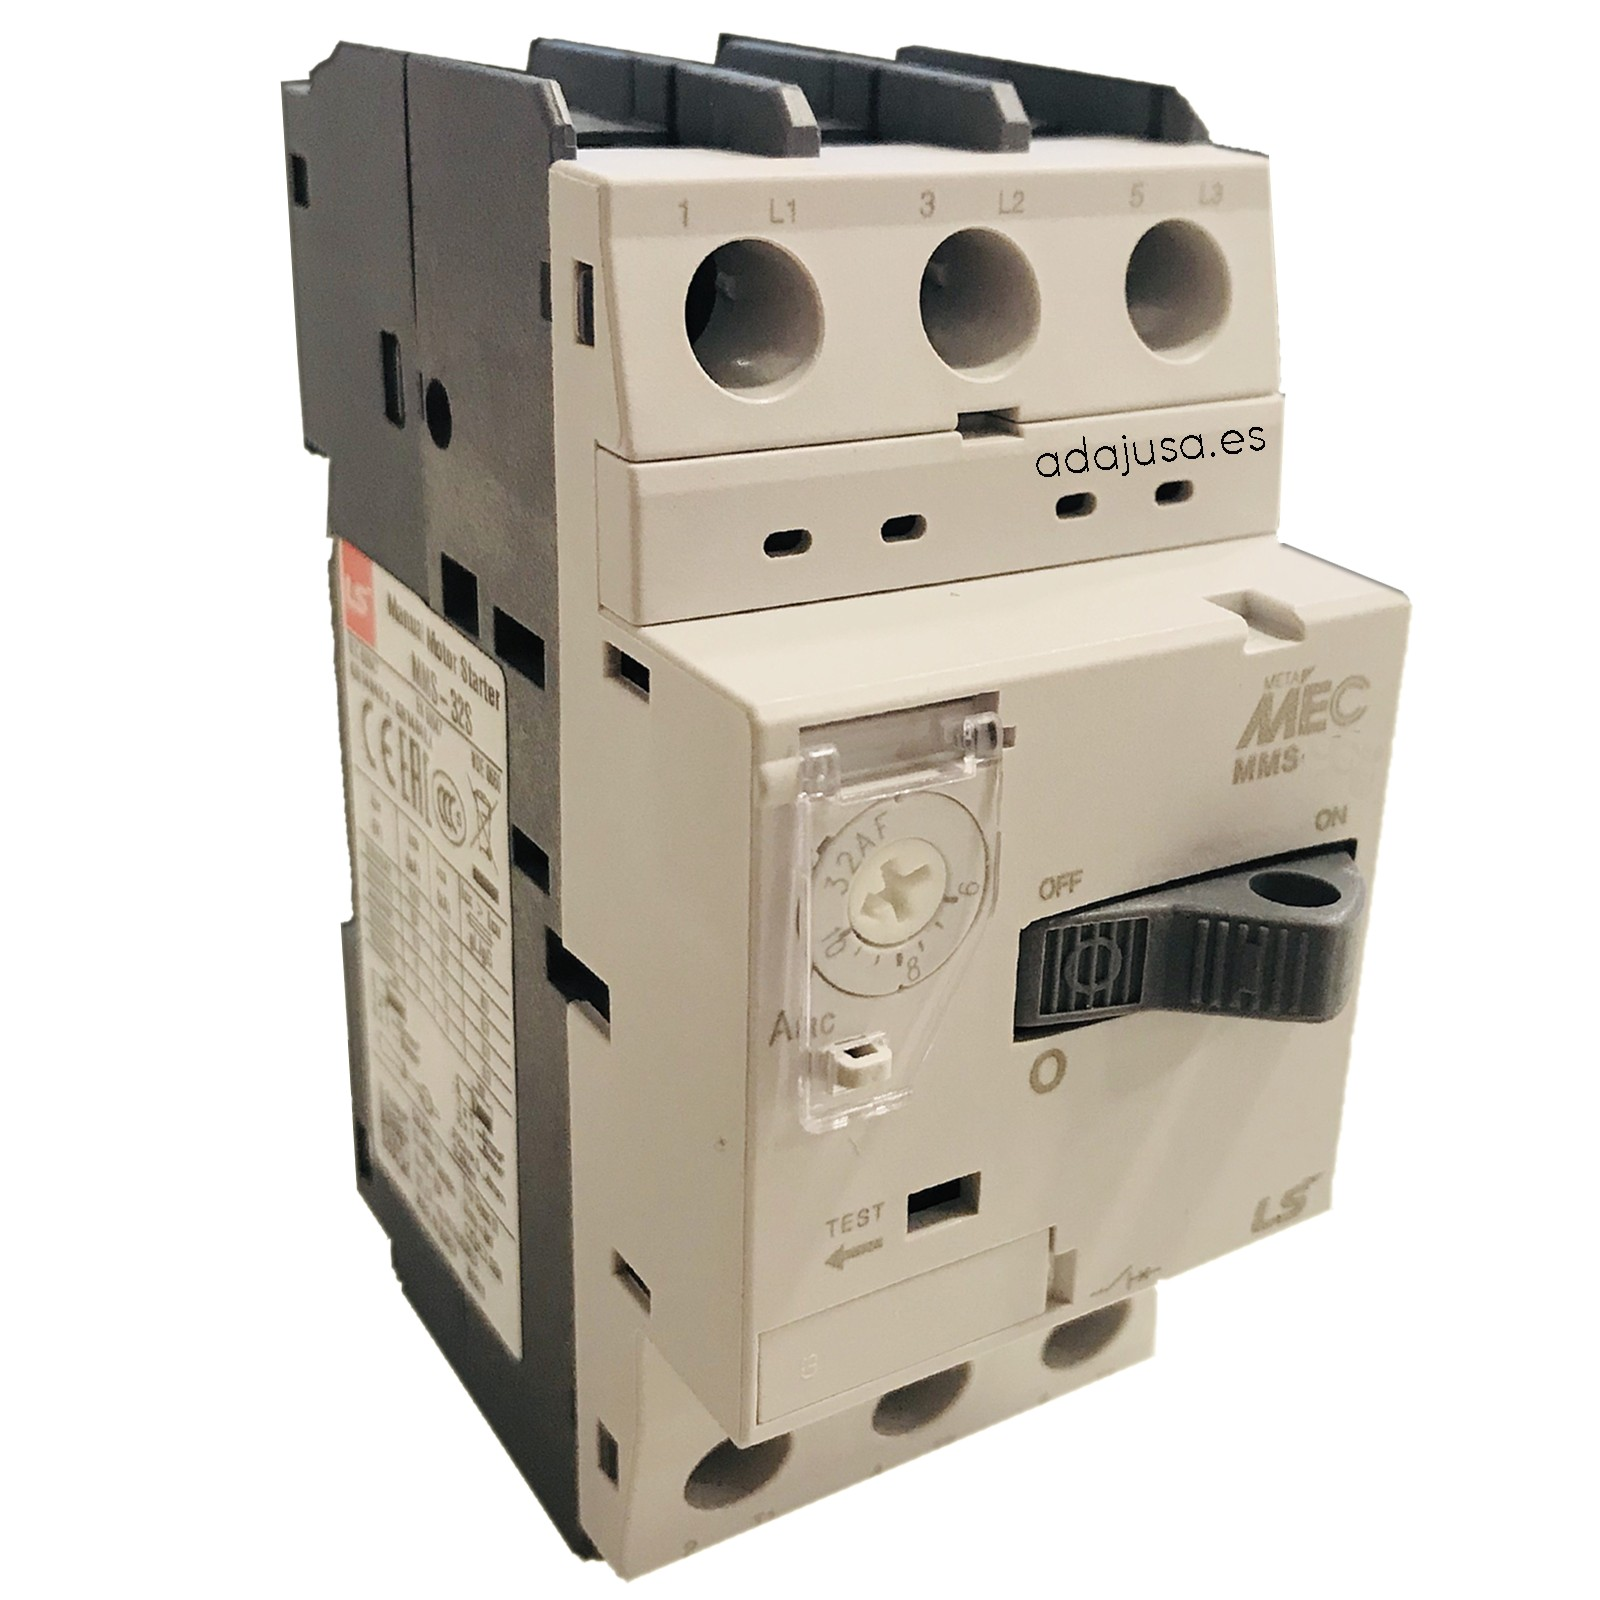 Interruttore salvamotore da 2,5 a 4 A MMS-32S - LSis